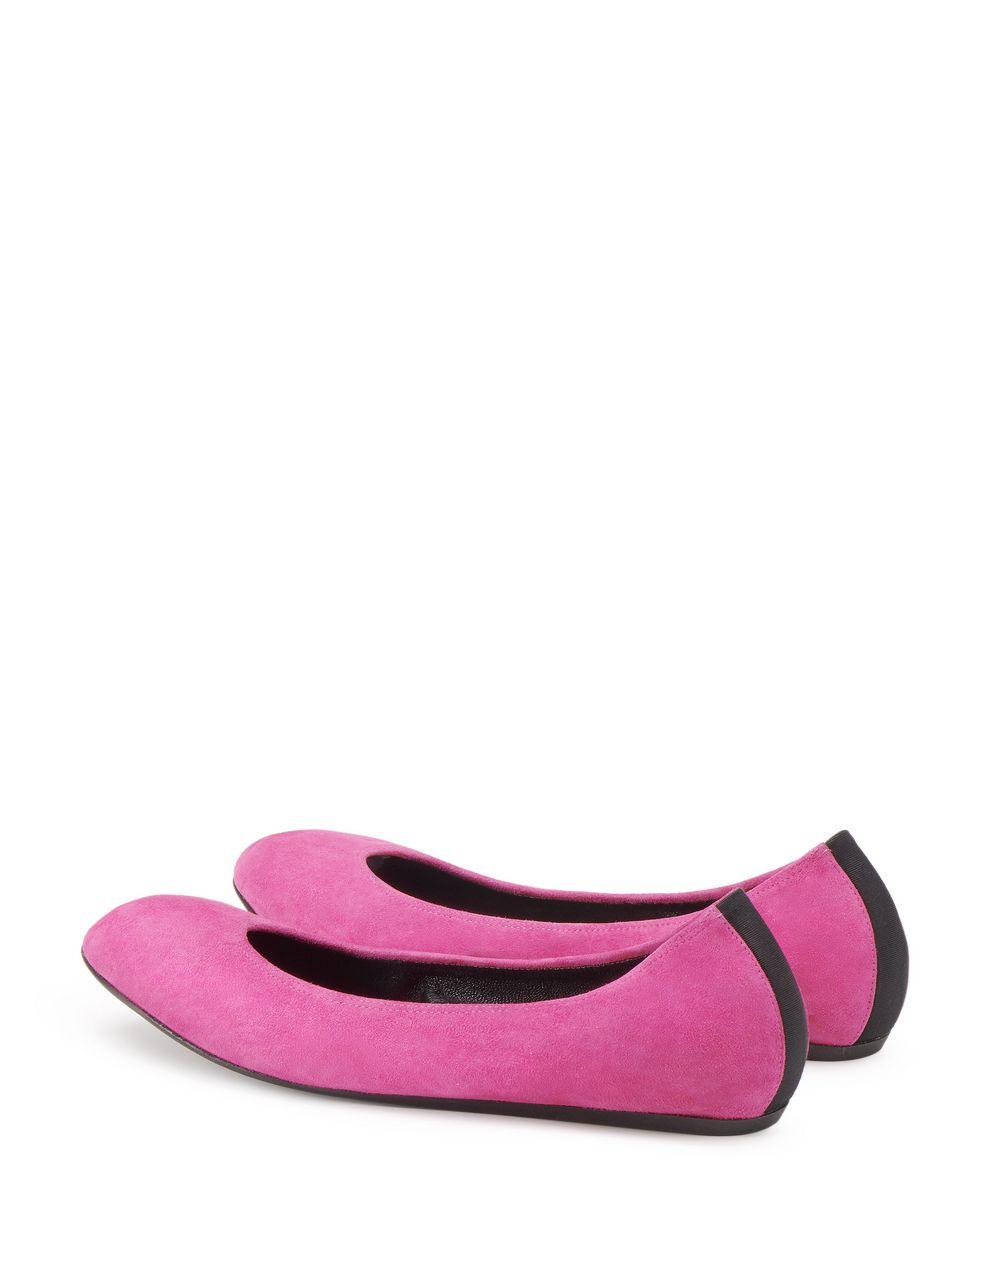 CLASSIC HOT PINK BALLET FLAT - Lanvin